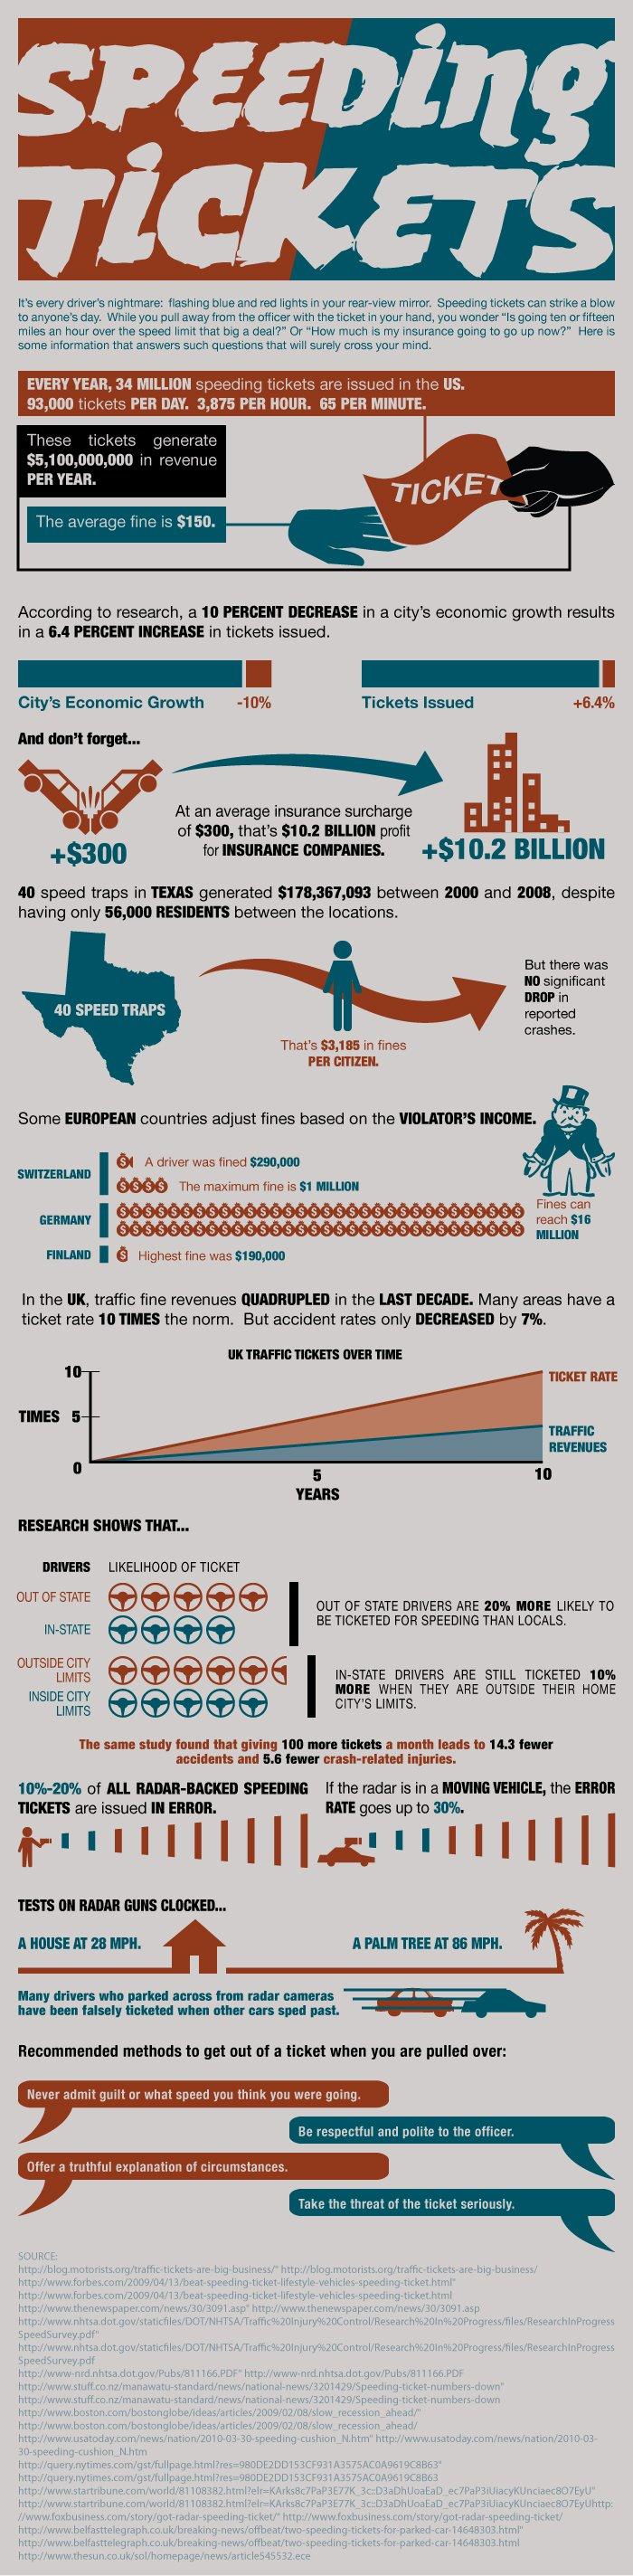 Miami Speeding Ticket Infographic